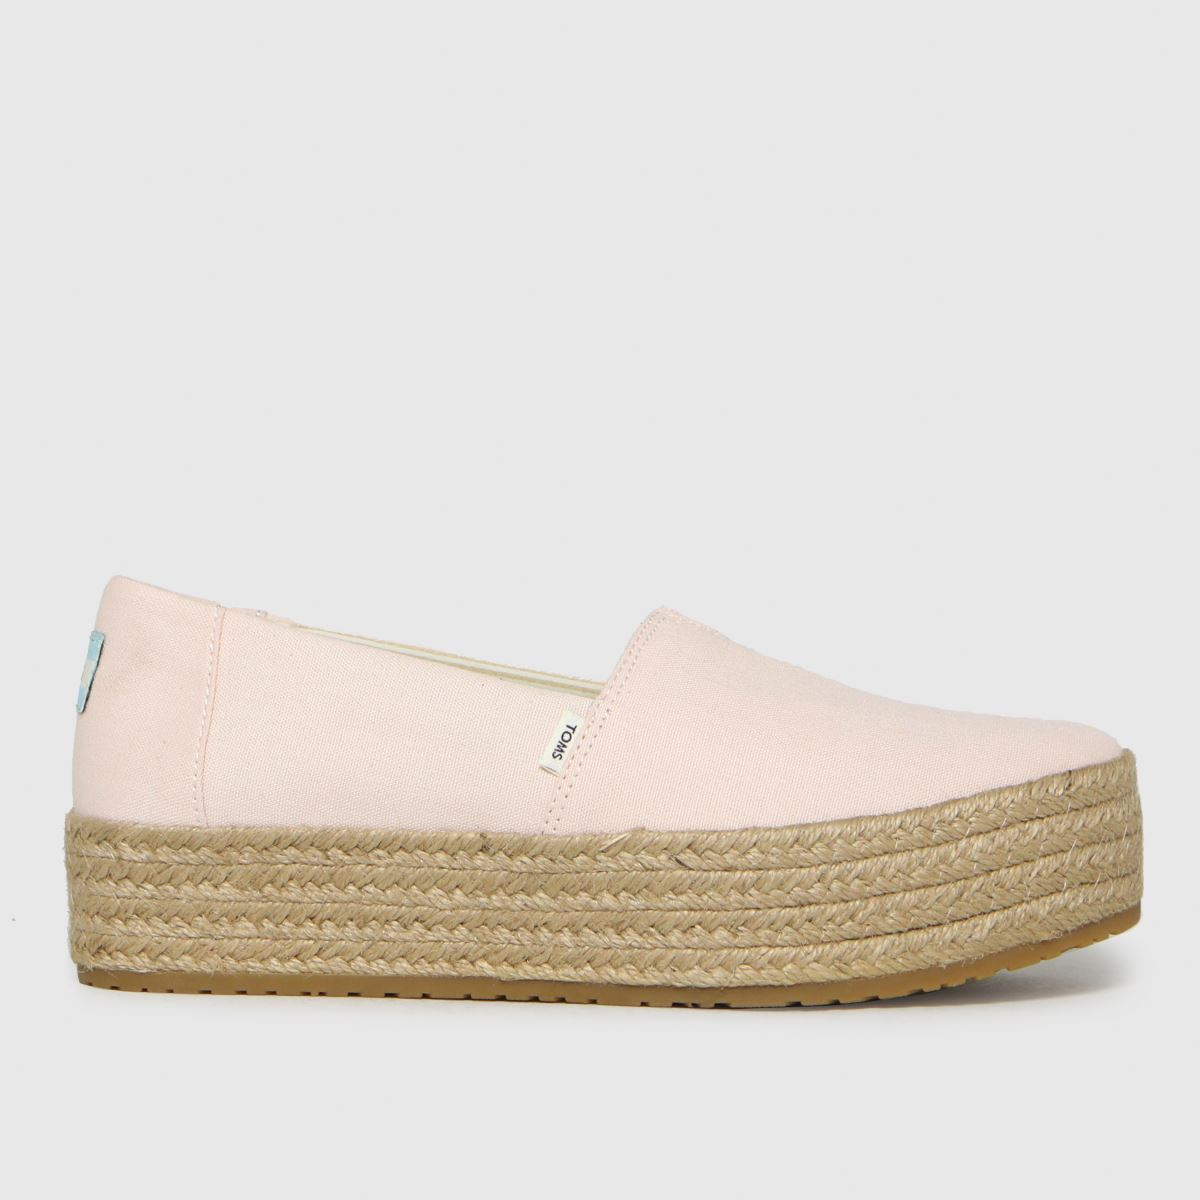 TOMS Beige Valencia Vegan Flat Shoes